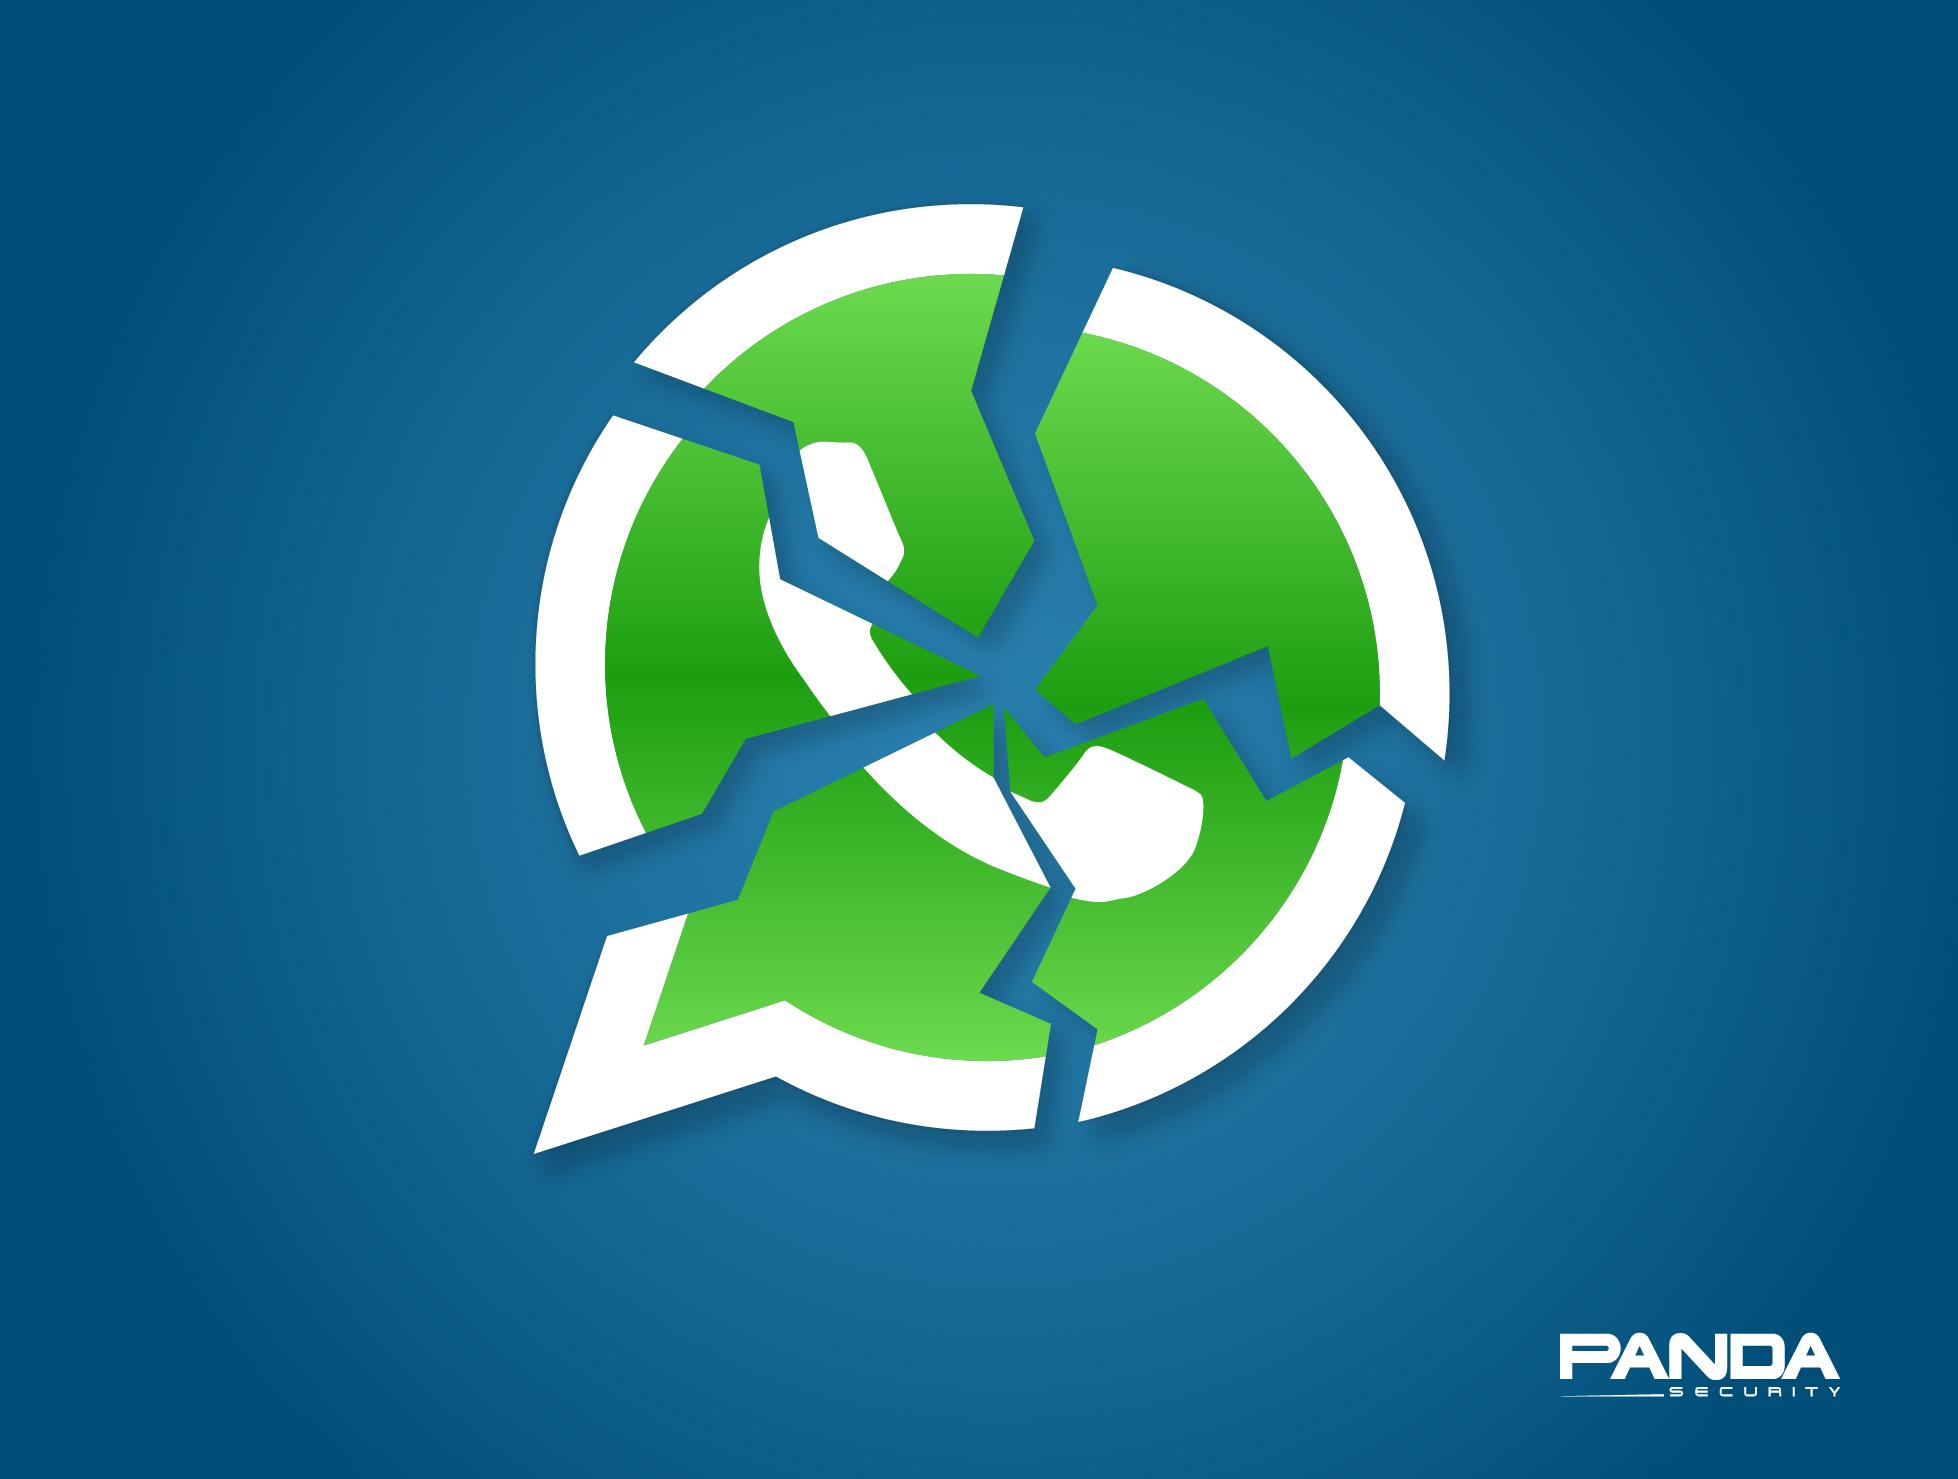 mensaje-muerte-whatsapp